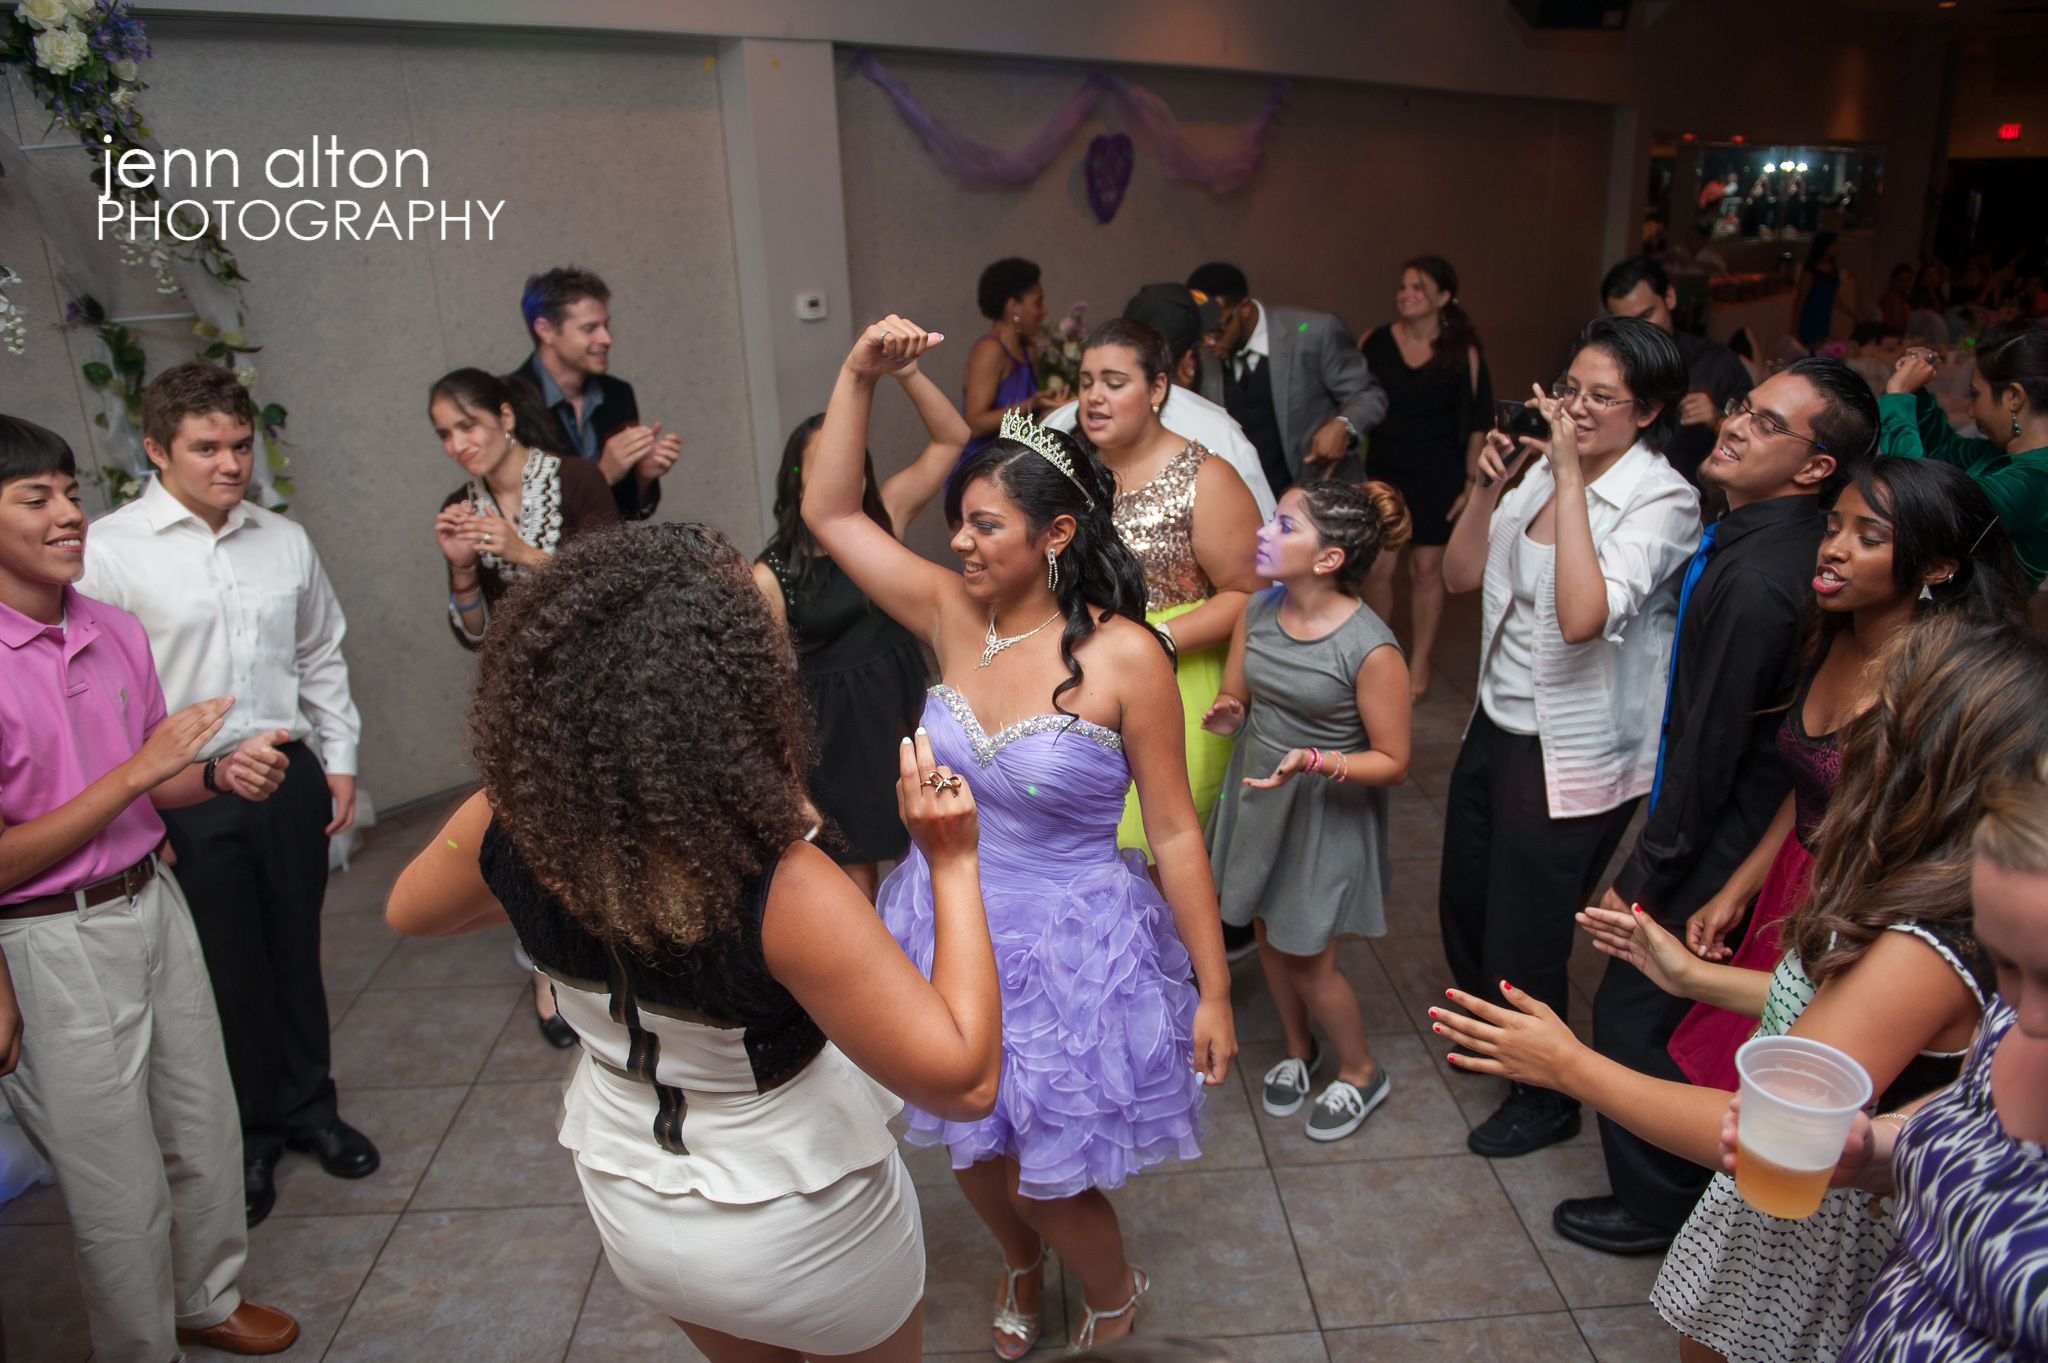 Quinceanera dancing at reception